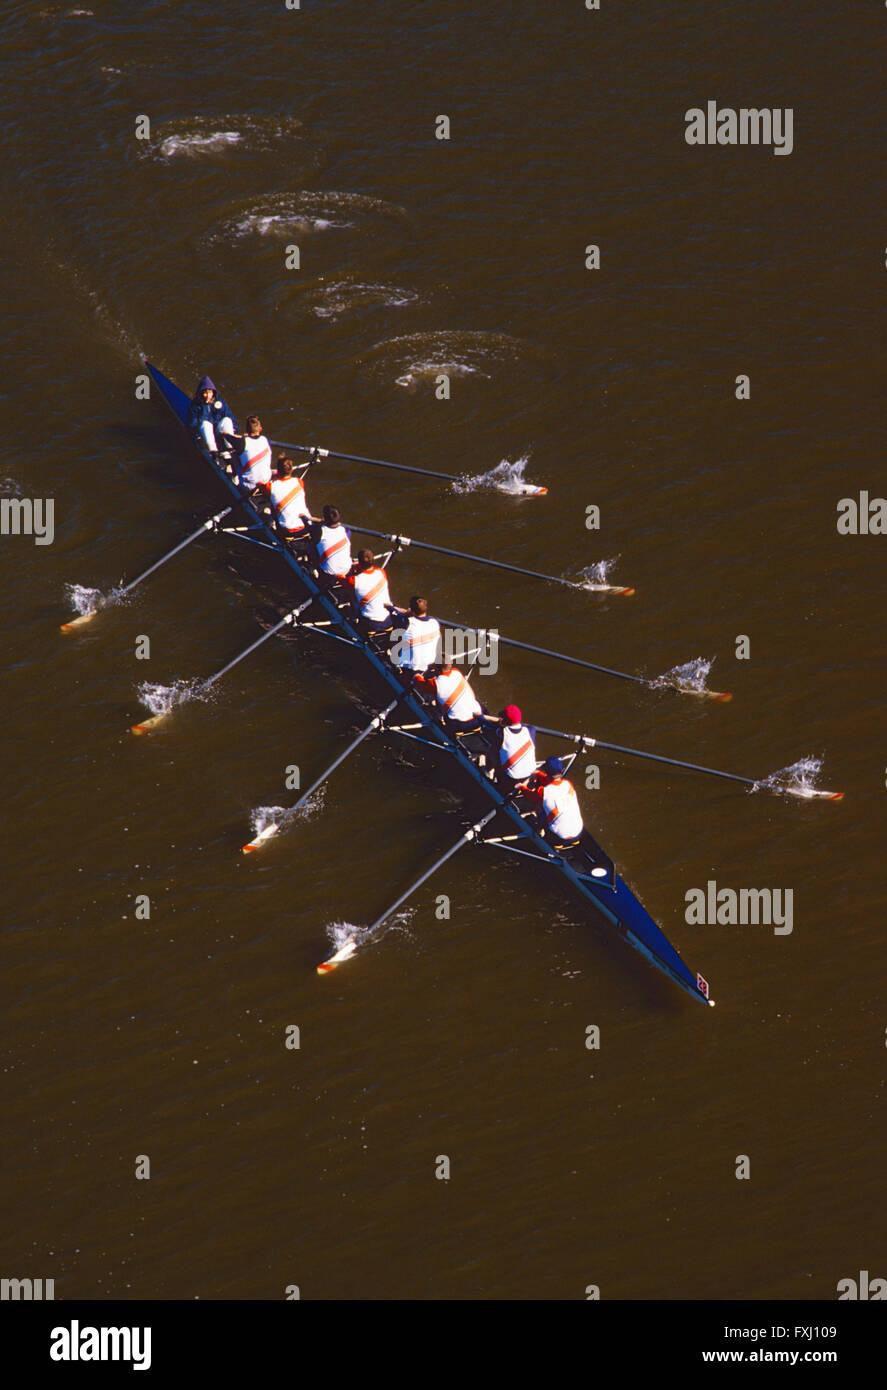 Paddler in den Kopf der Schuylkill Regatta Rudern; Delaware River; Philadelphia; Pennsylvania; USA Stockbild